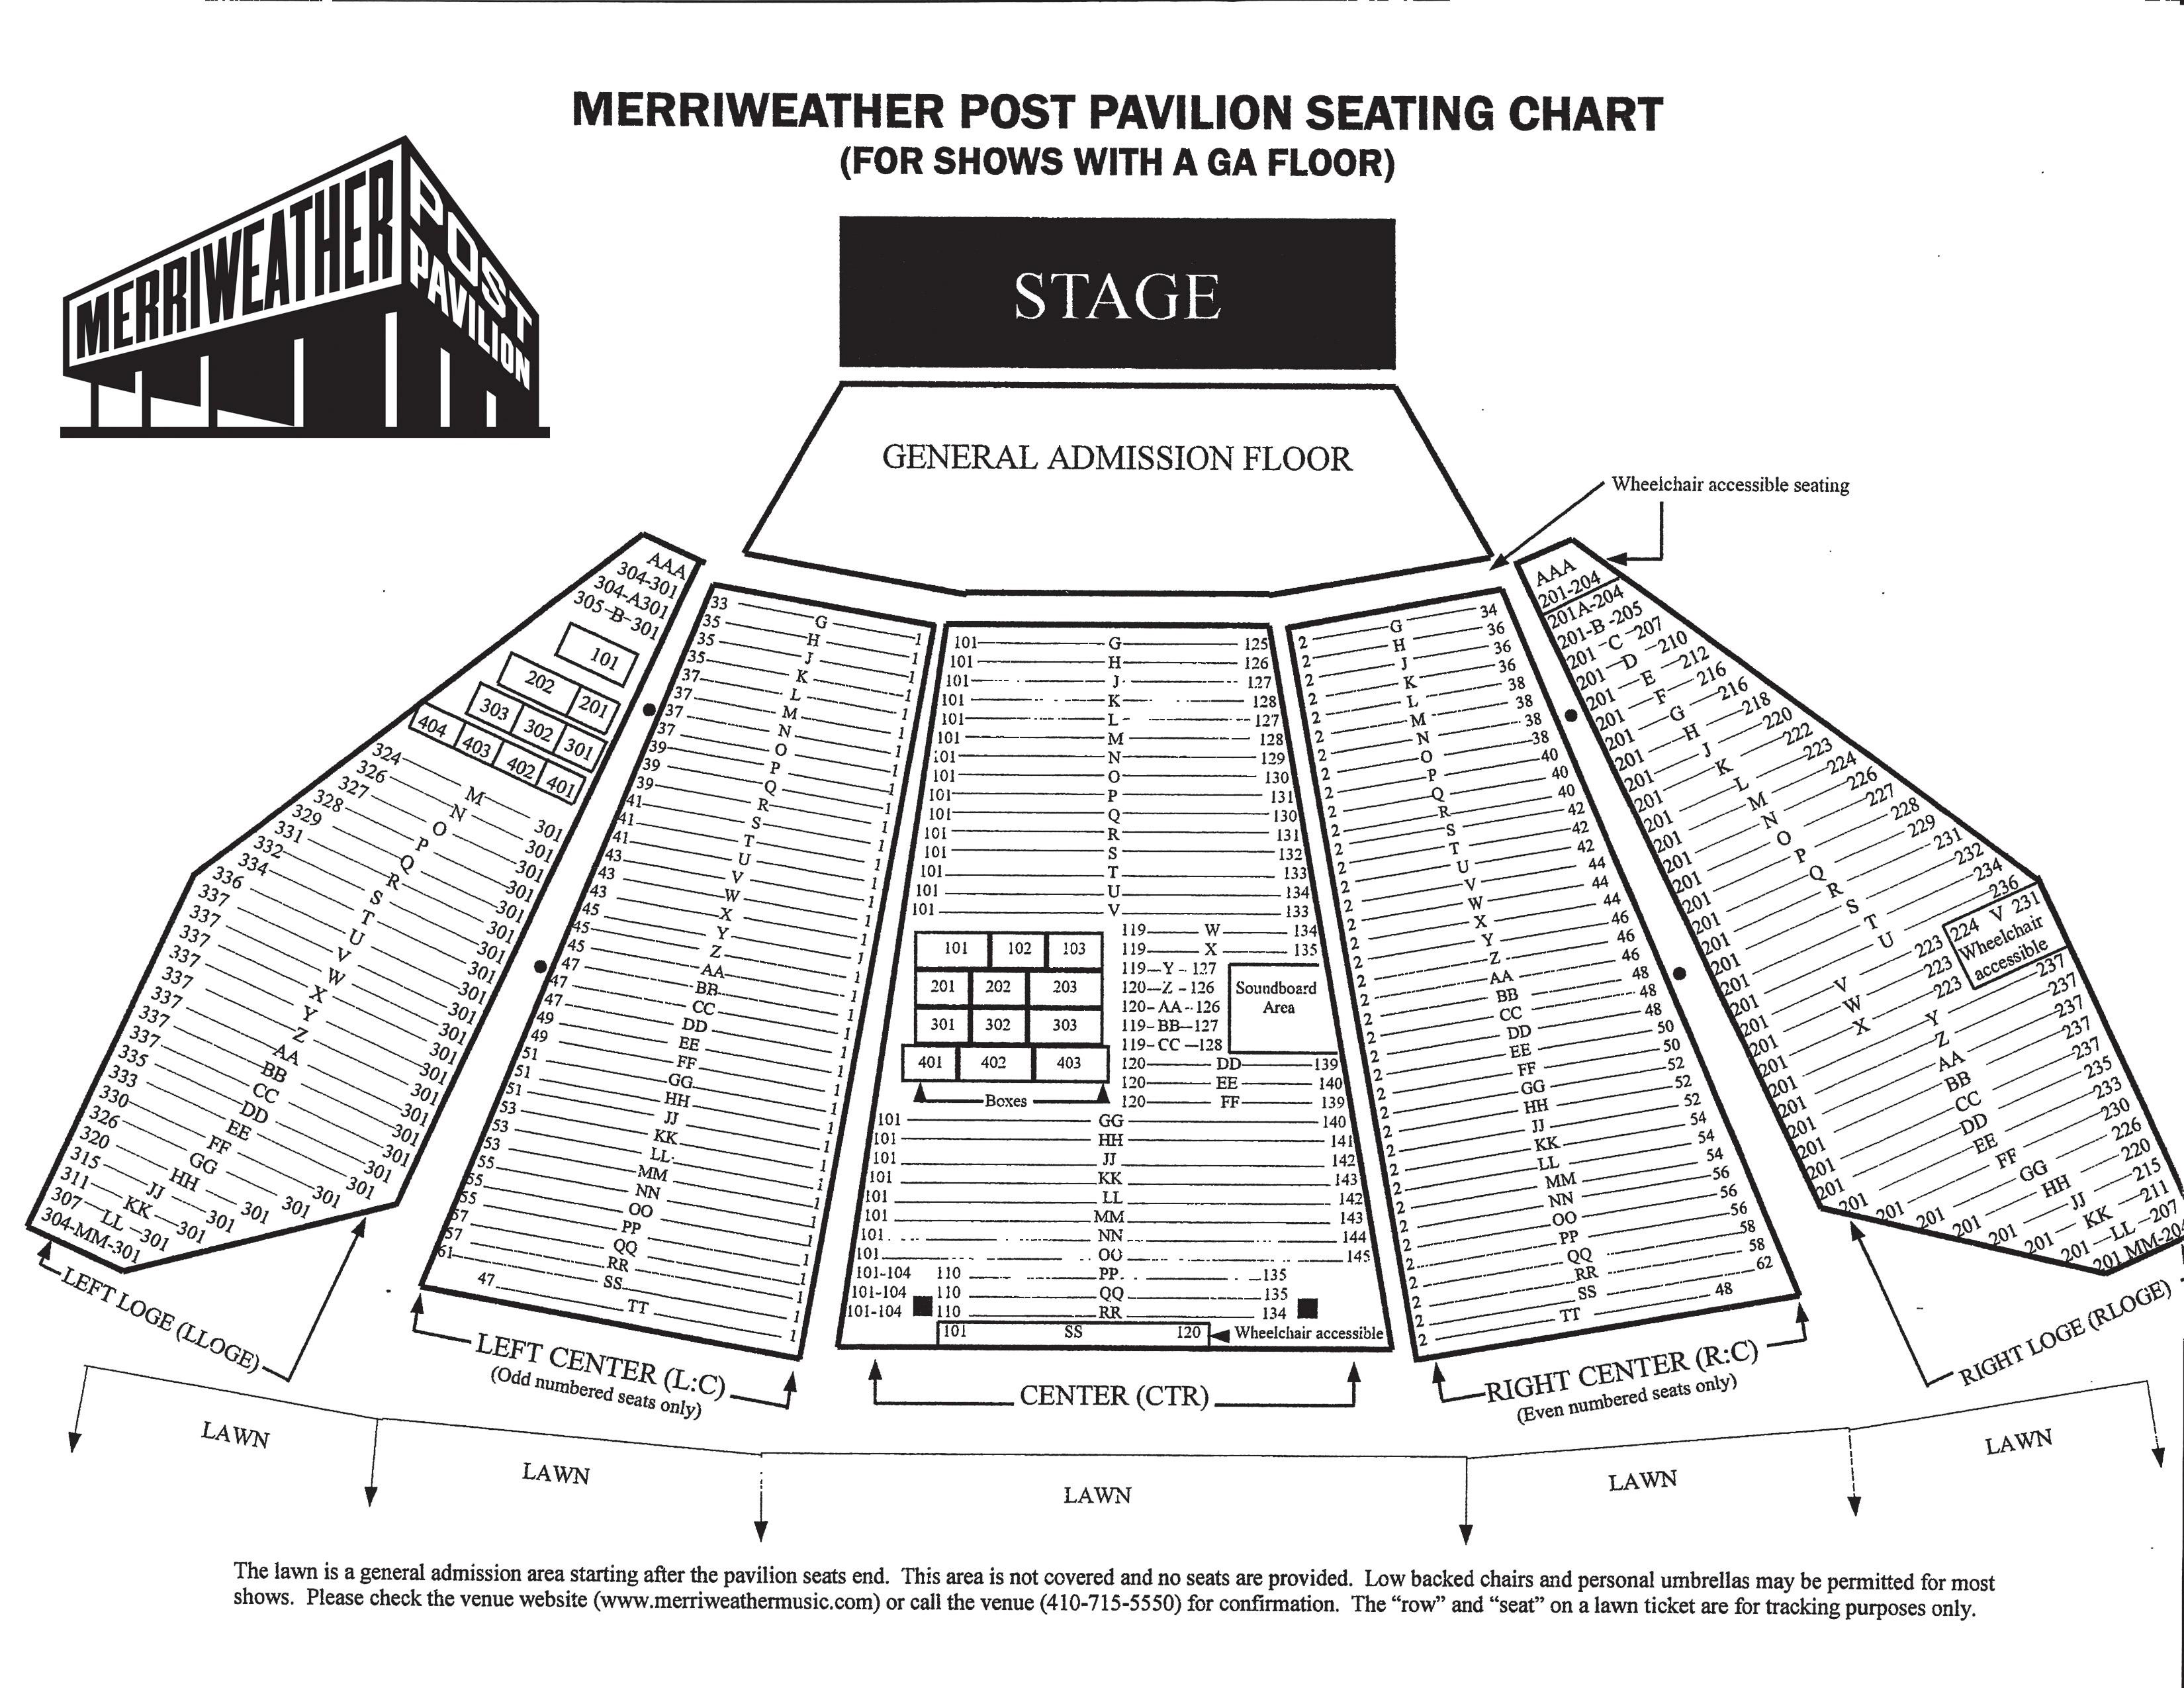 Merriweather Post Pavilion Seating Chart Merriweather